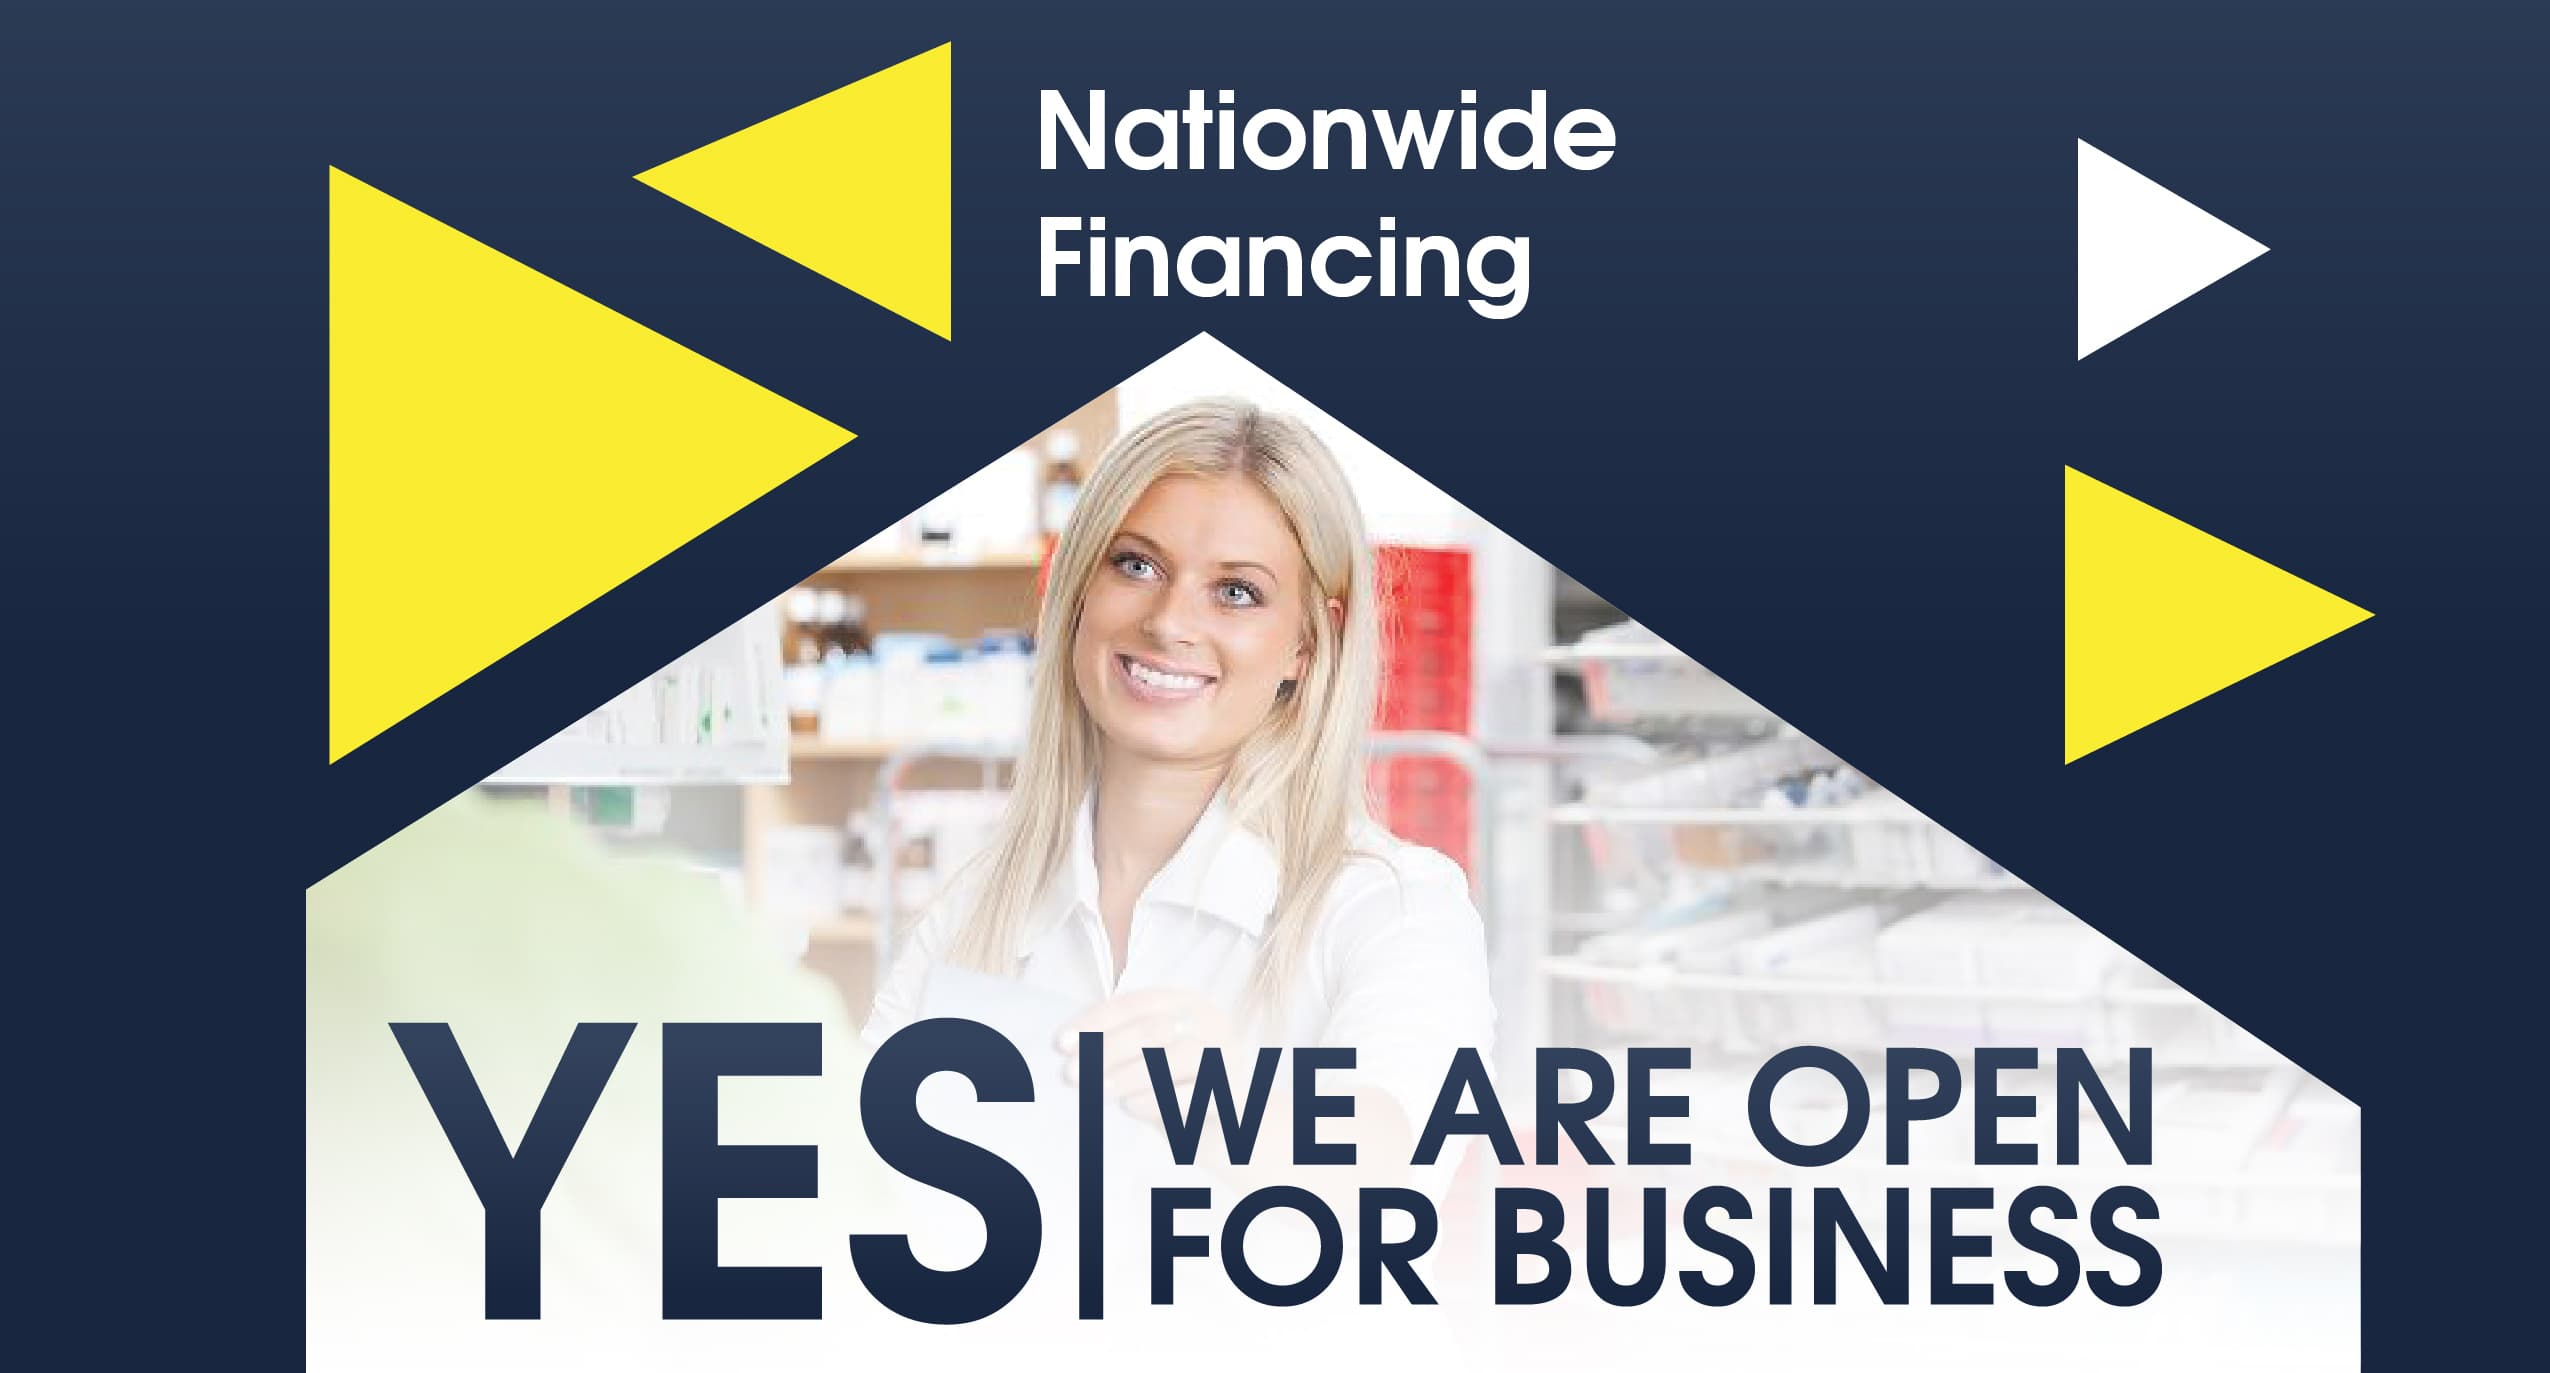 Nationwide Financing